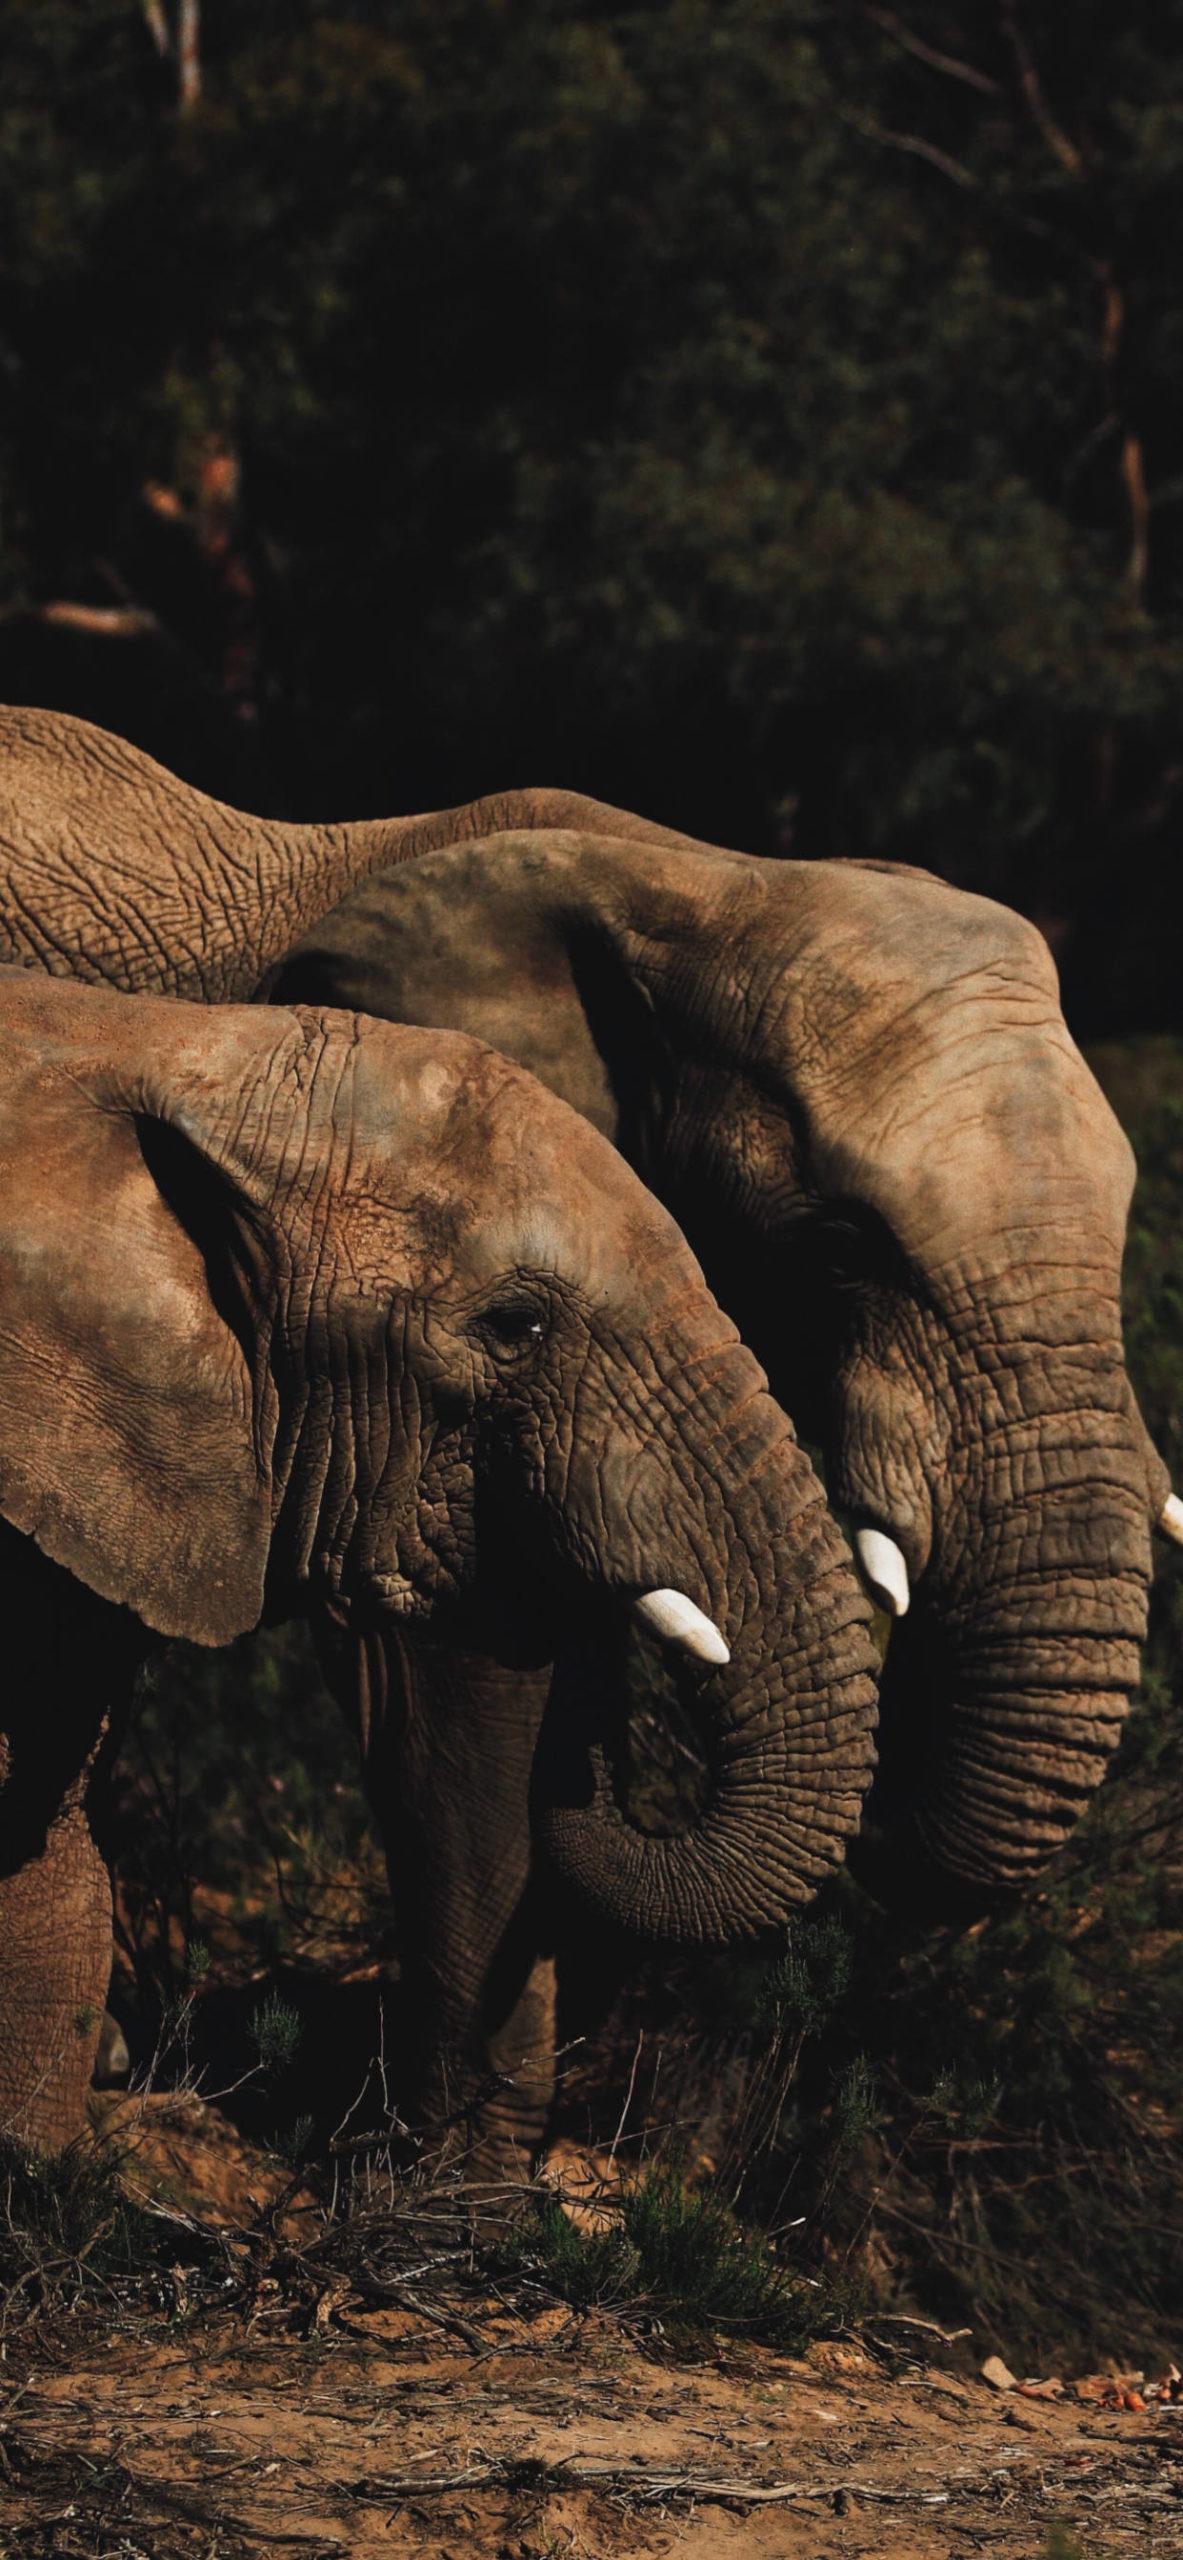 iPhone wallpapers animal elephant couple scaled Elephant